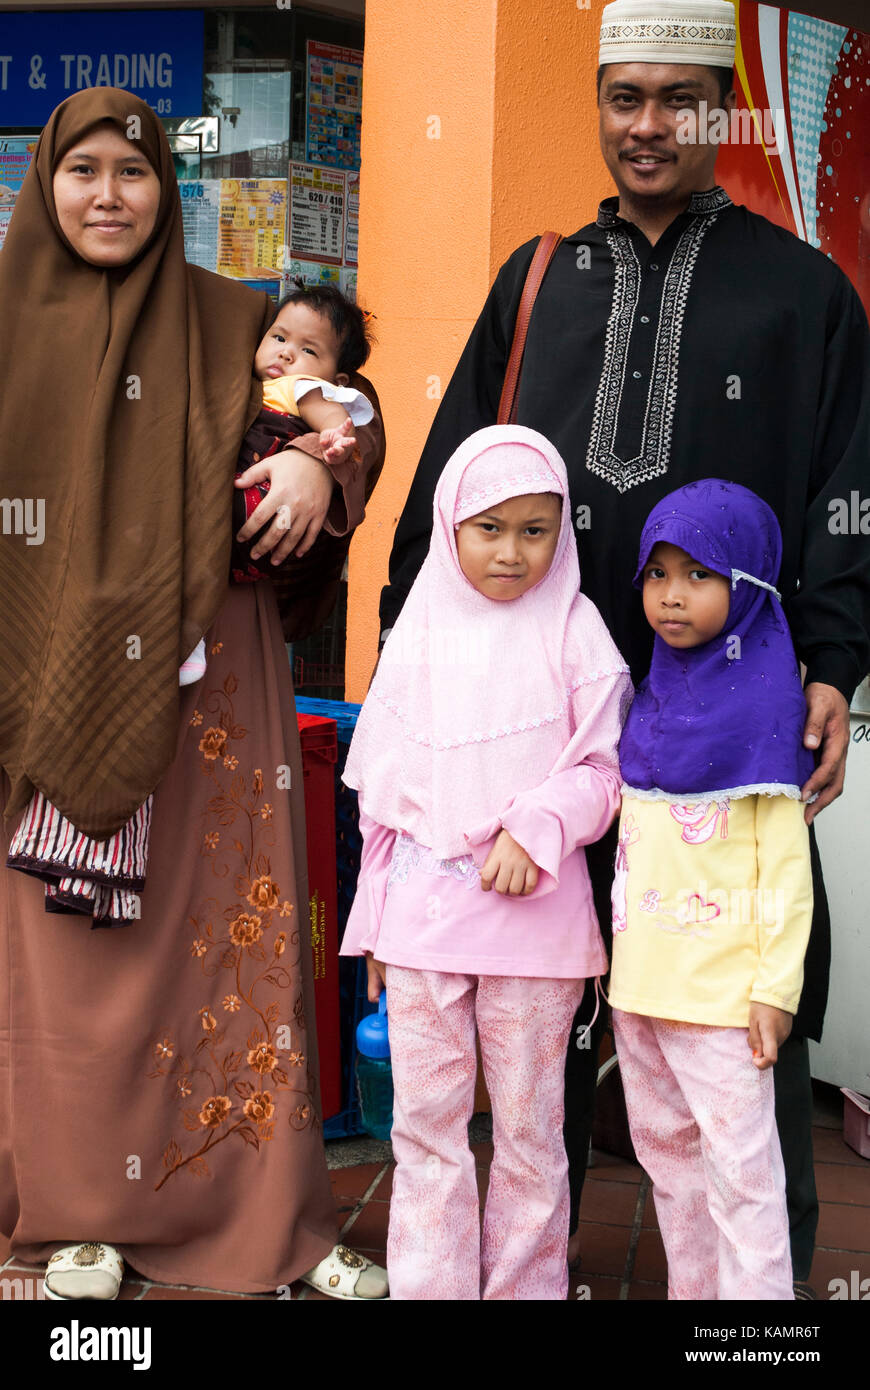 Malay family outside the Geylang Serai market, Singapore - Stock Image